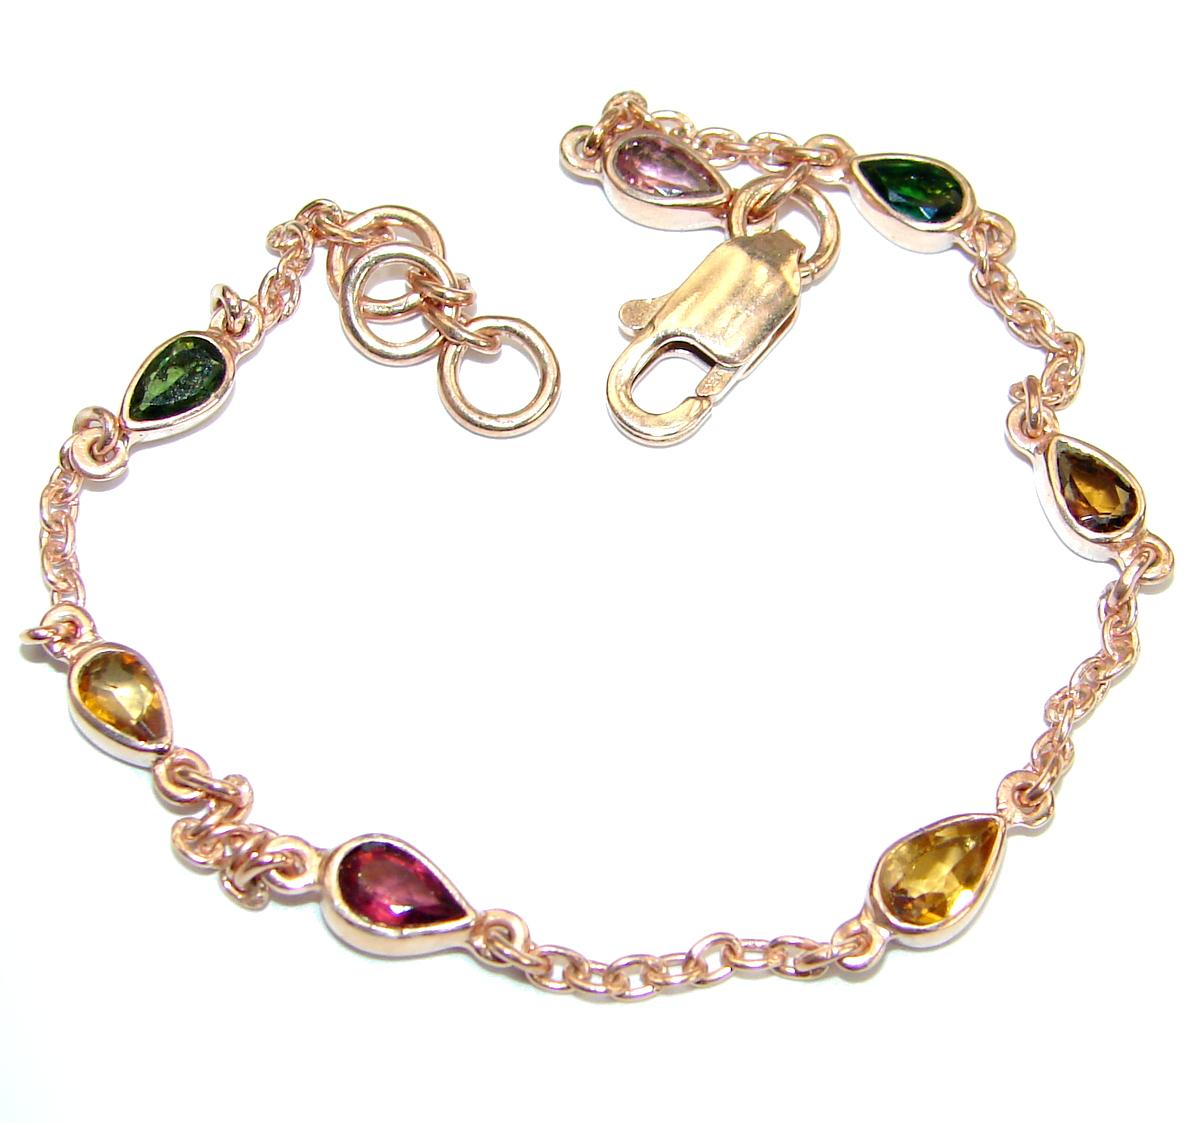 Genuine Tourmaline Rose Gold over .925 Sterling Silver handmade Bracelet by SilverRush Style by Tourmaline Bracelets